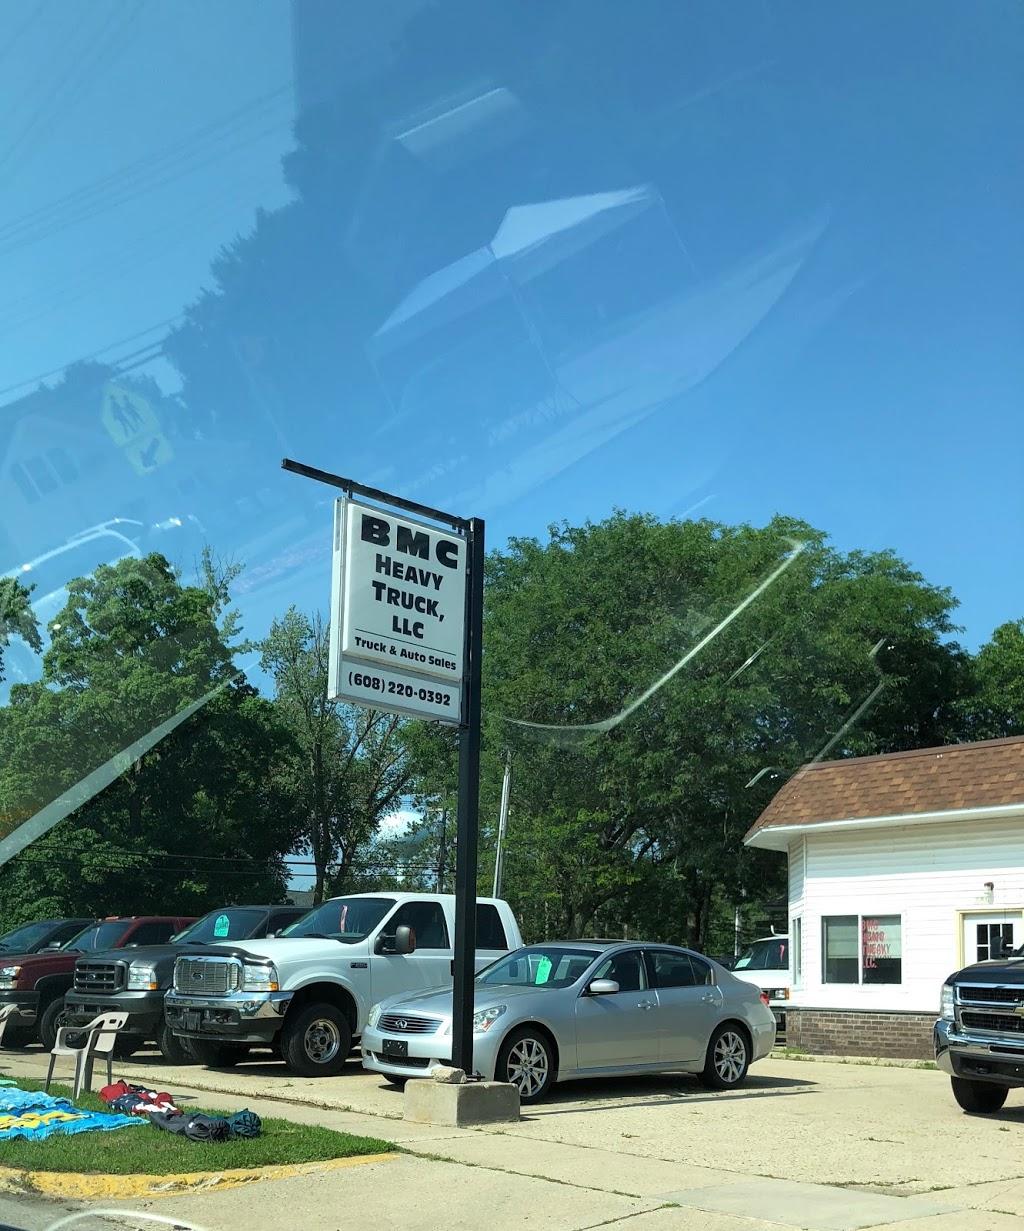 BMC Heavy Truck LLC - car dealer  | Photo 1 of 1 | Address: 101 N Main St, Pardeeville, WI 53954, USA | Phone: (608) 220-0392